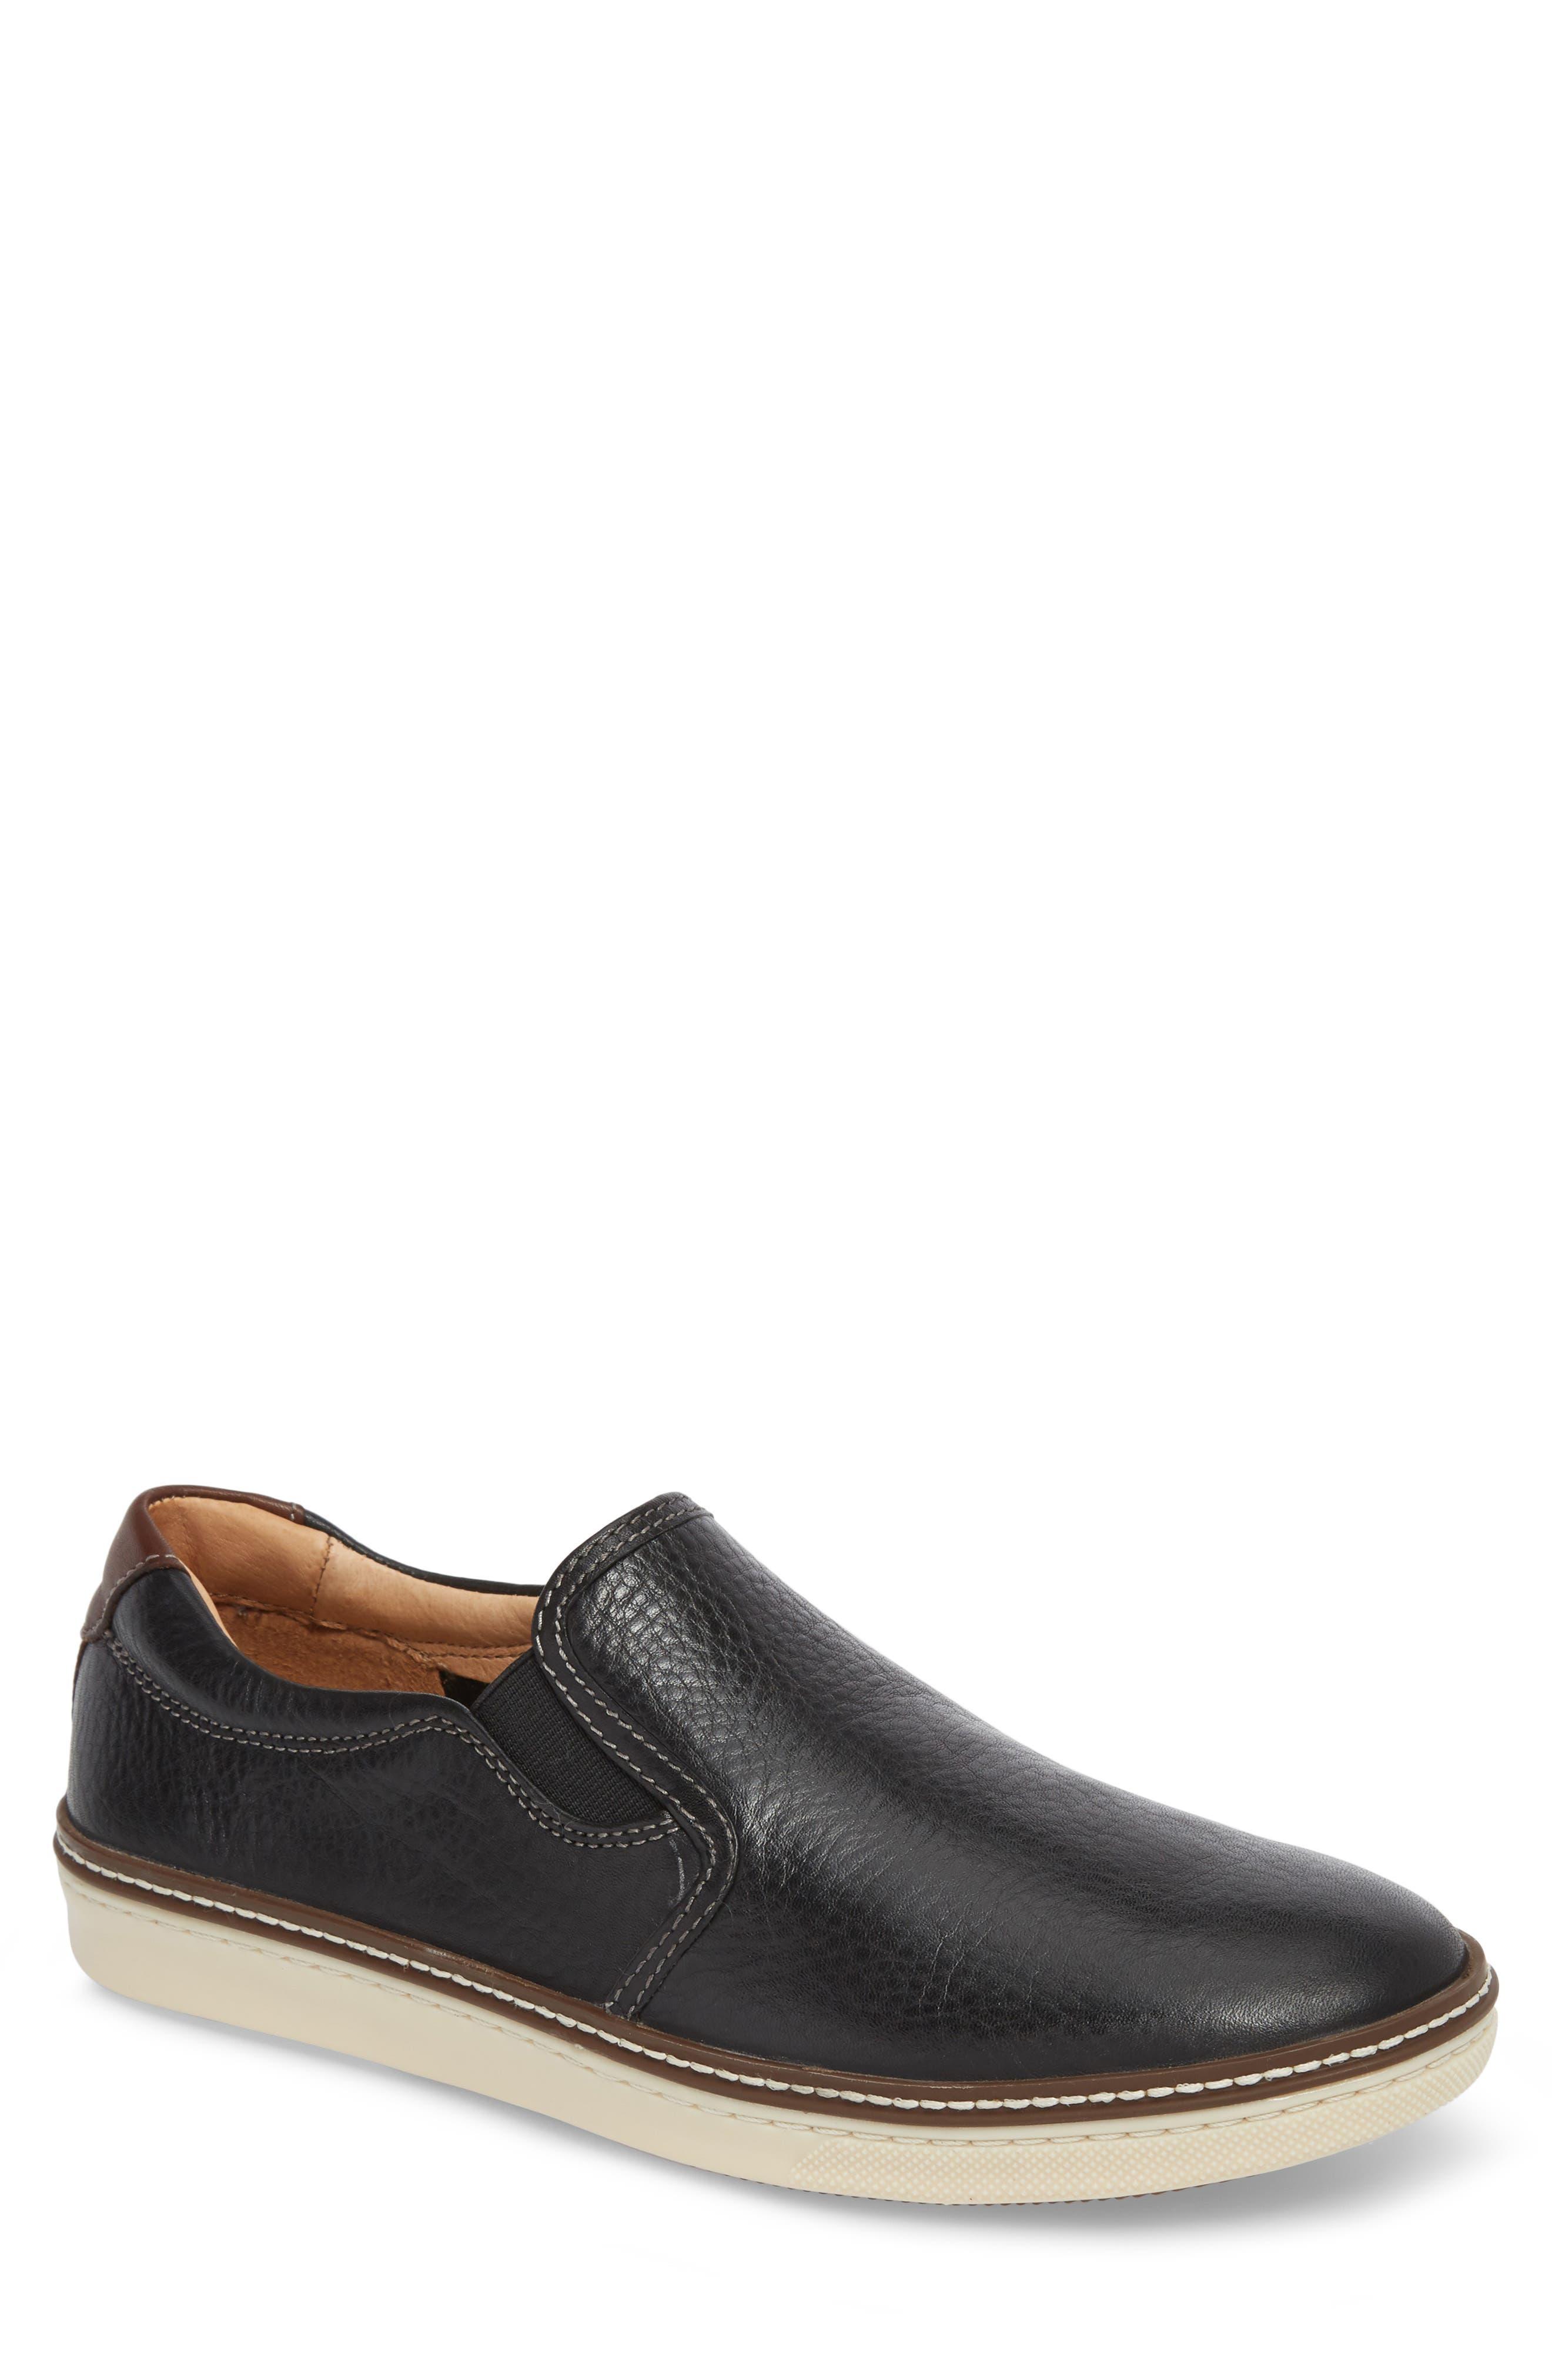 JOHNSTON & MURPHY McGuffey Slip-On Sneaker, Main, color, BLACK LEATHER